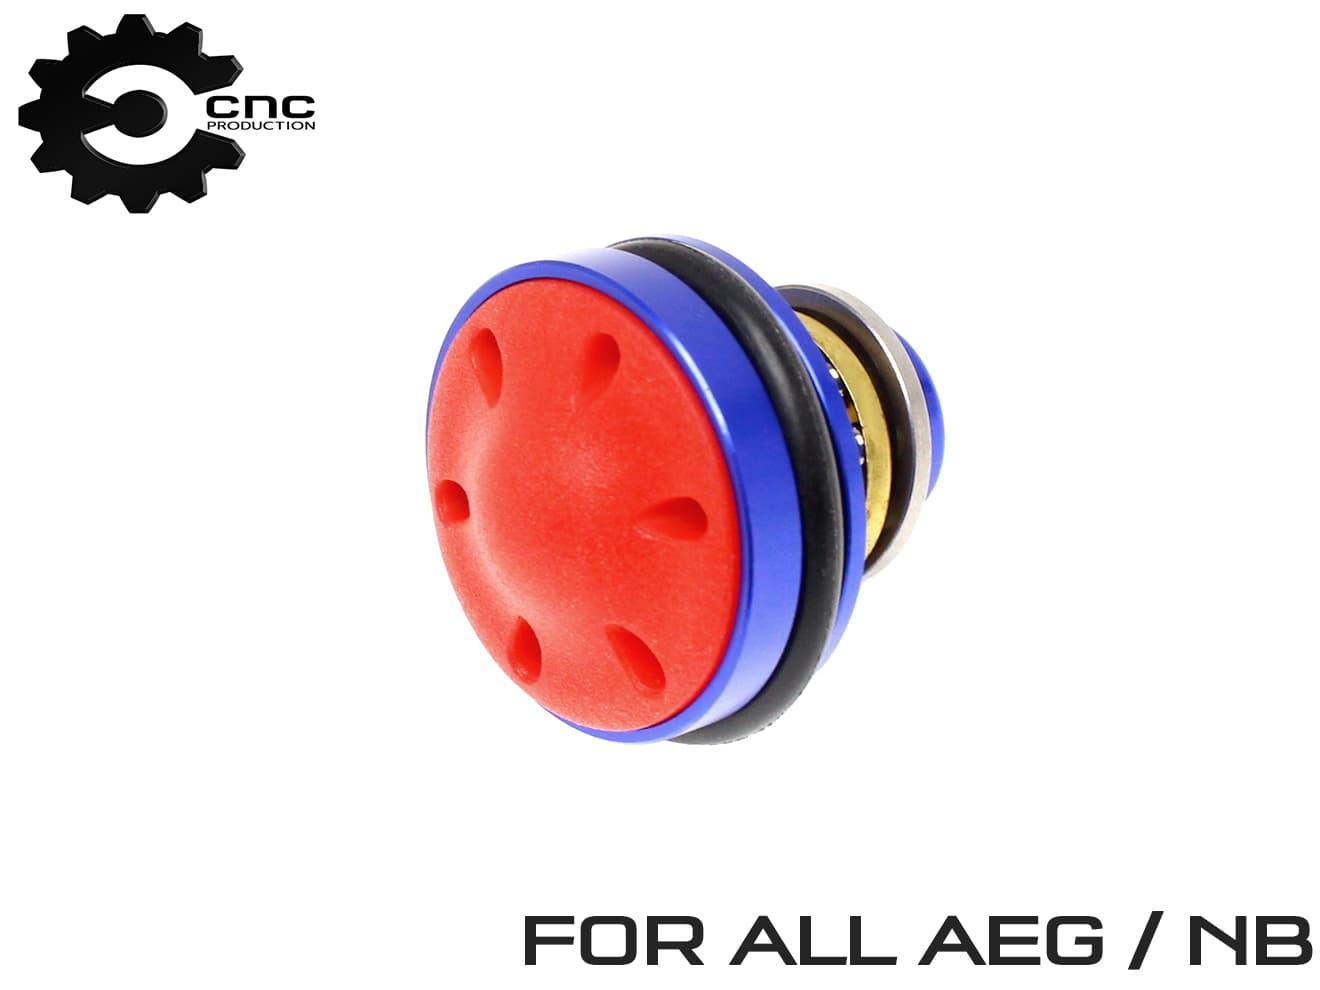 CNC-Production ピストンヘッド サイレント 後方吸気 マーケット 強化 補修 電動ガン AEG Ver2 Ver3 M4A1 AK47 MP5 P90 マルイ Production アルミ合金 VFC WE ノーマルボアシリンダー用 各社電動ガン GG KRYTAC 新品 送料無料 ラバーパッドで打撃音削減 ARES ICS CNC ベアリング APS